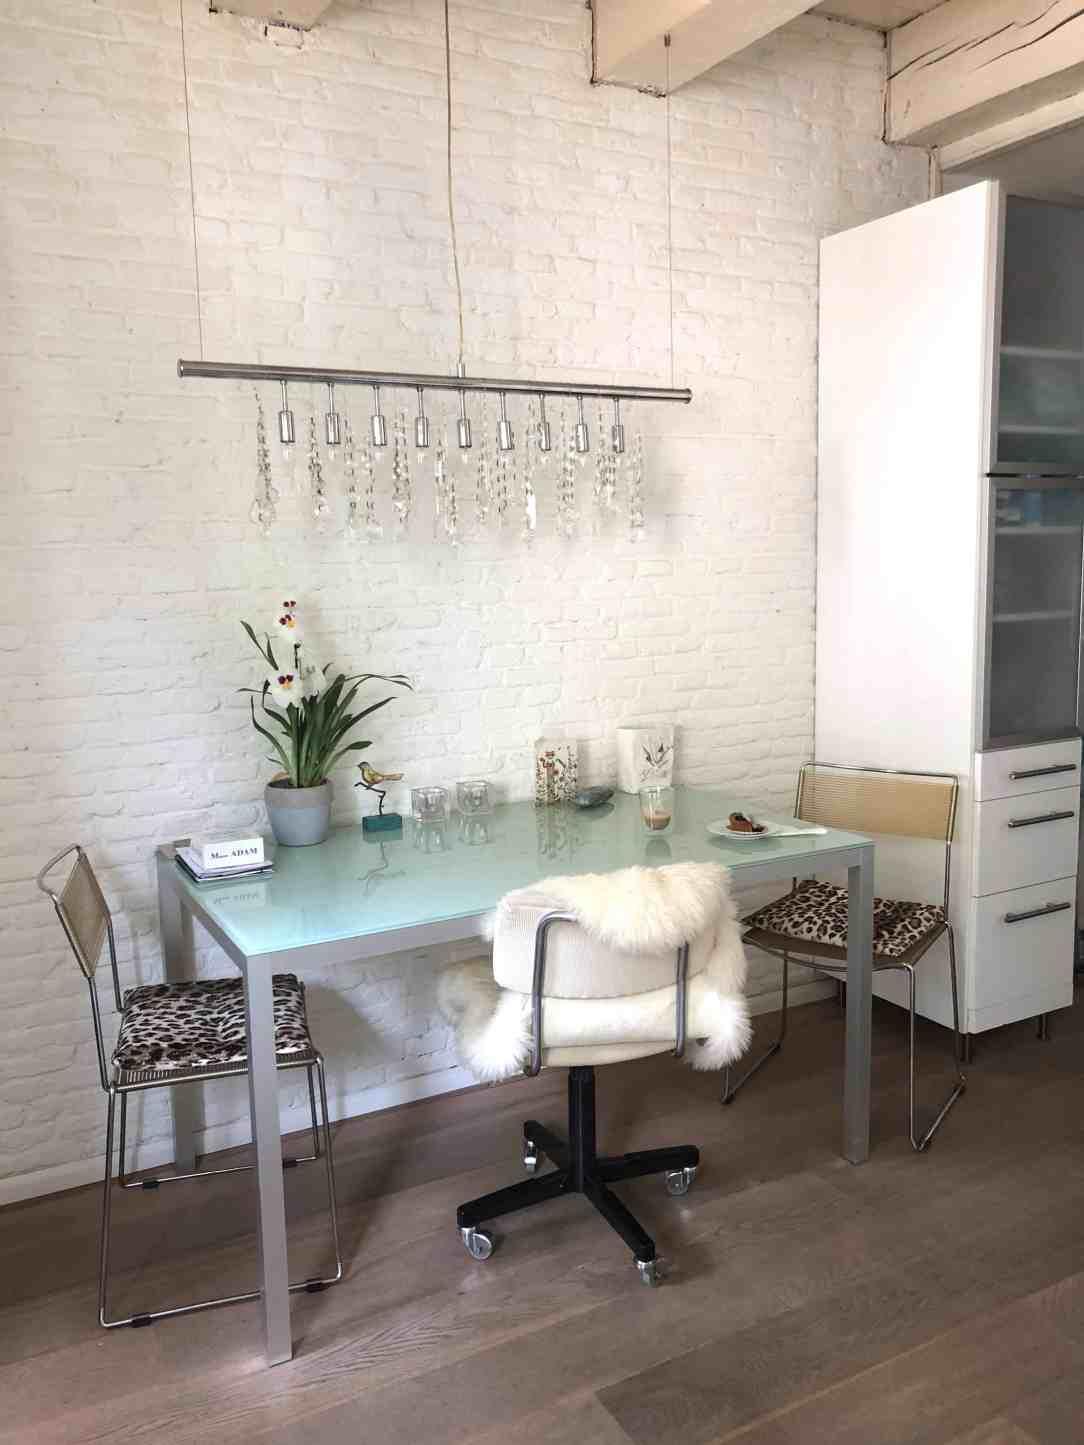 wonen op 55 m2-witte bakstenen muur